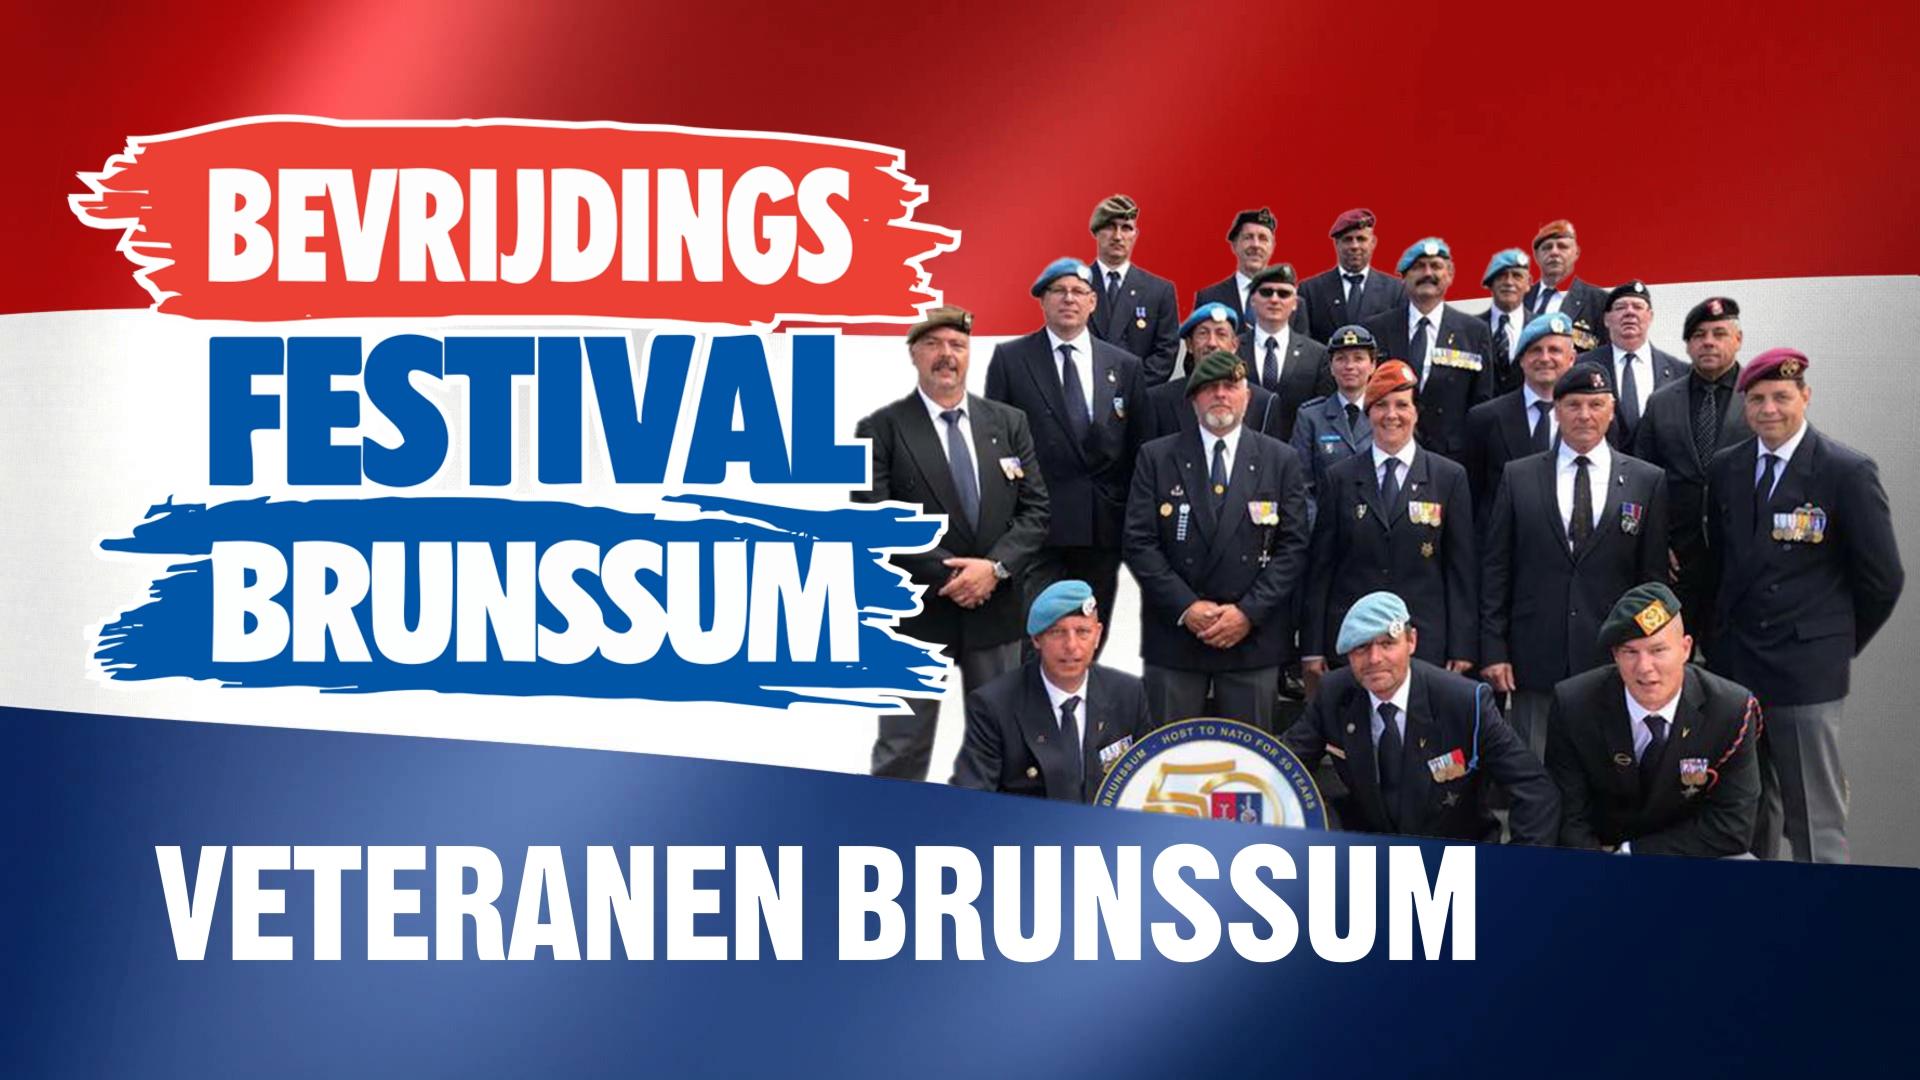 Veteranen Brunssum